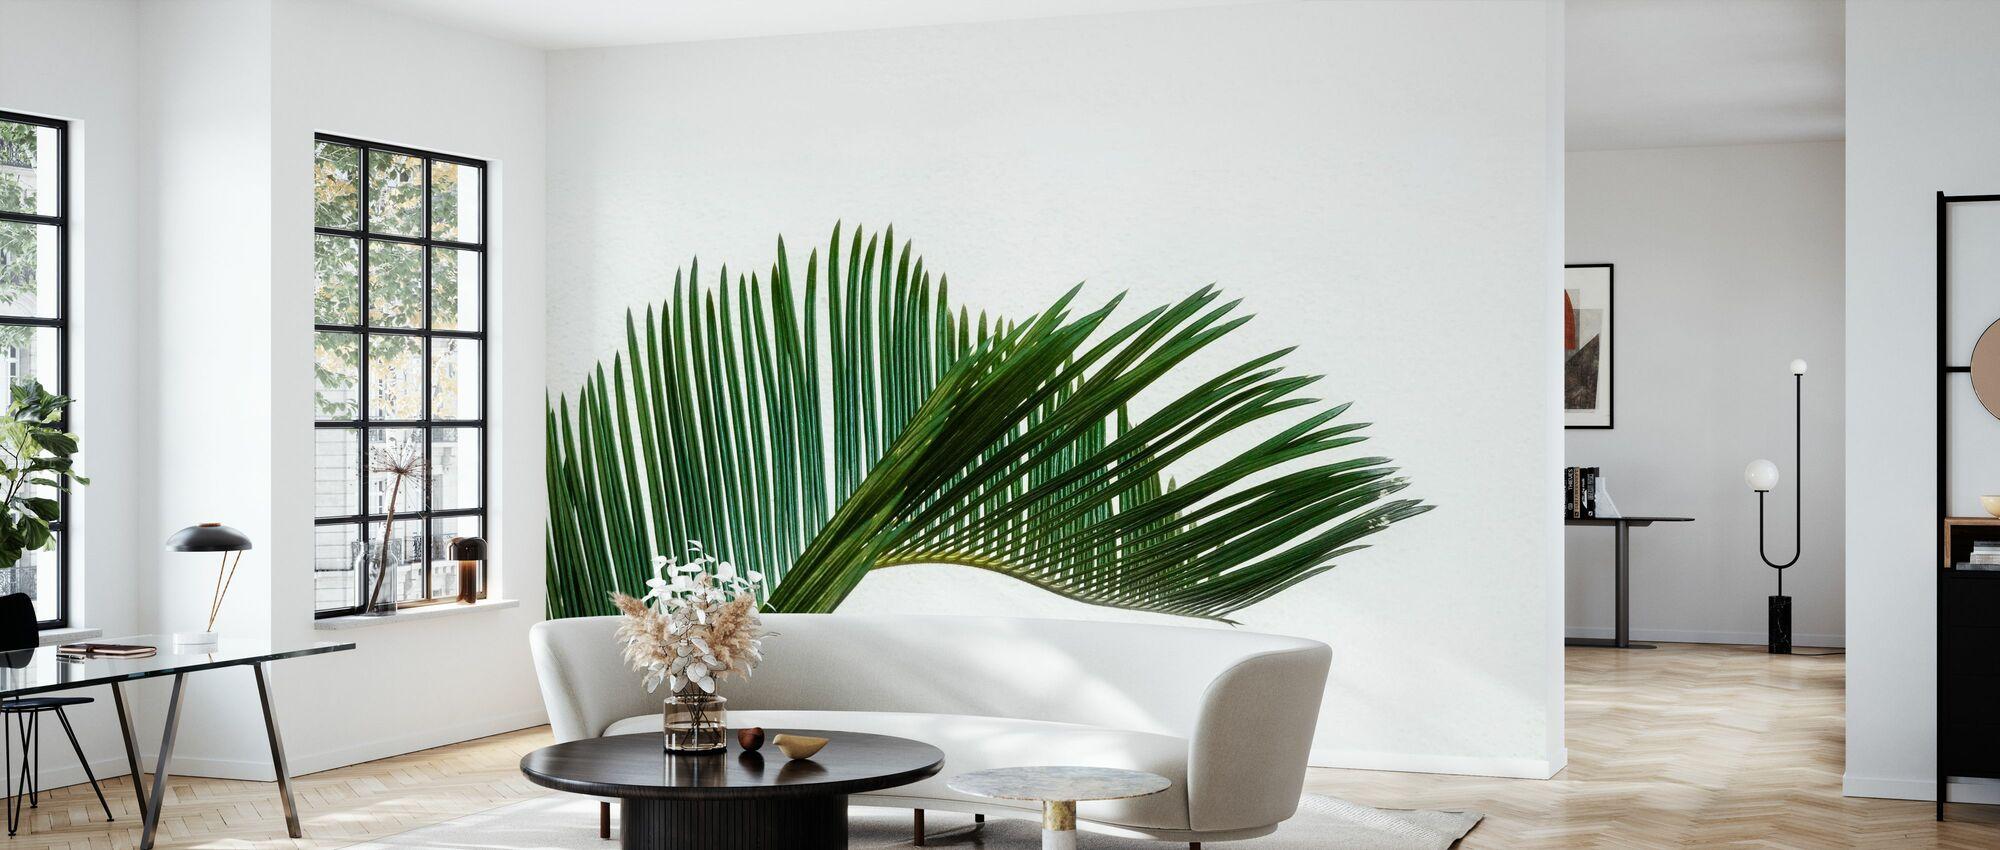 Palm Foliage - Wallpaper - Living Room